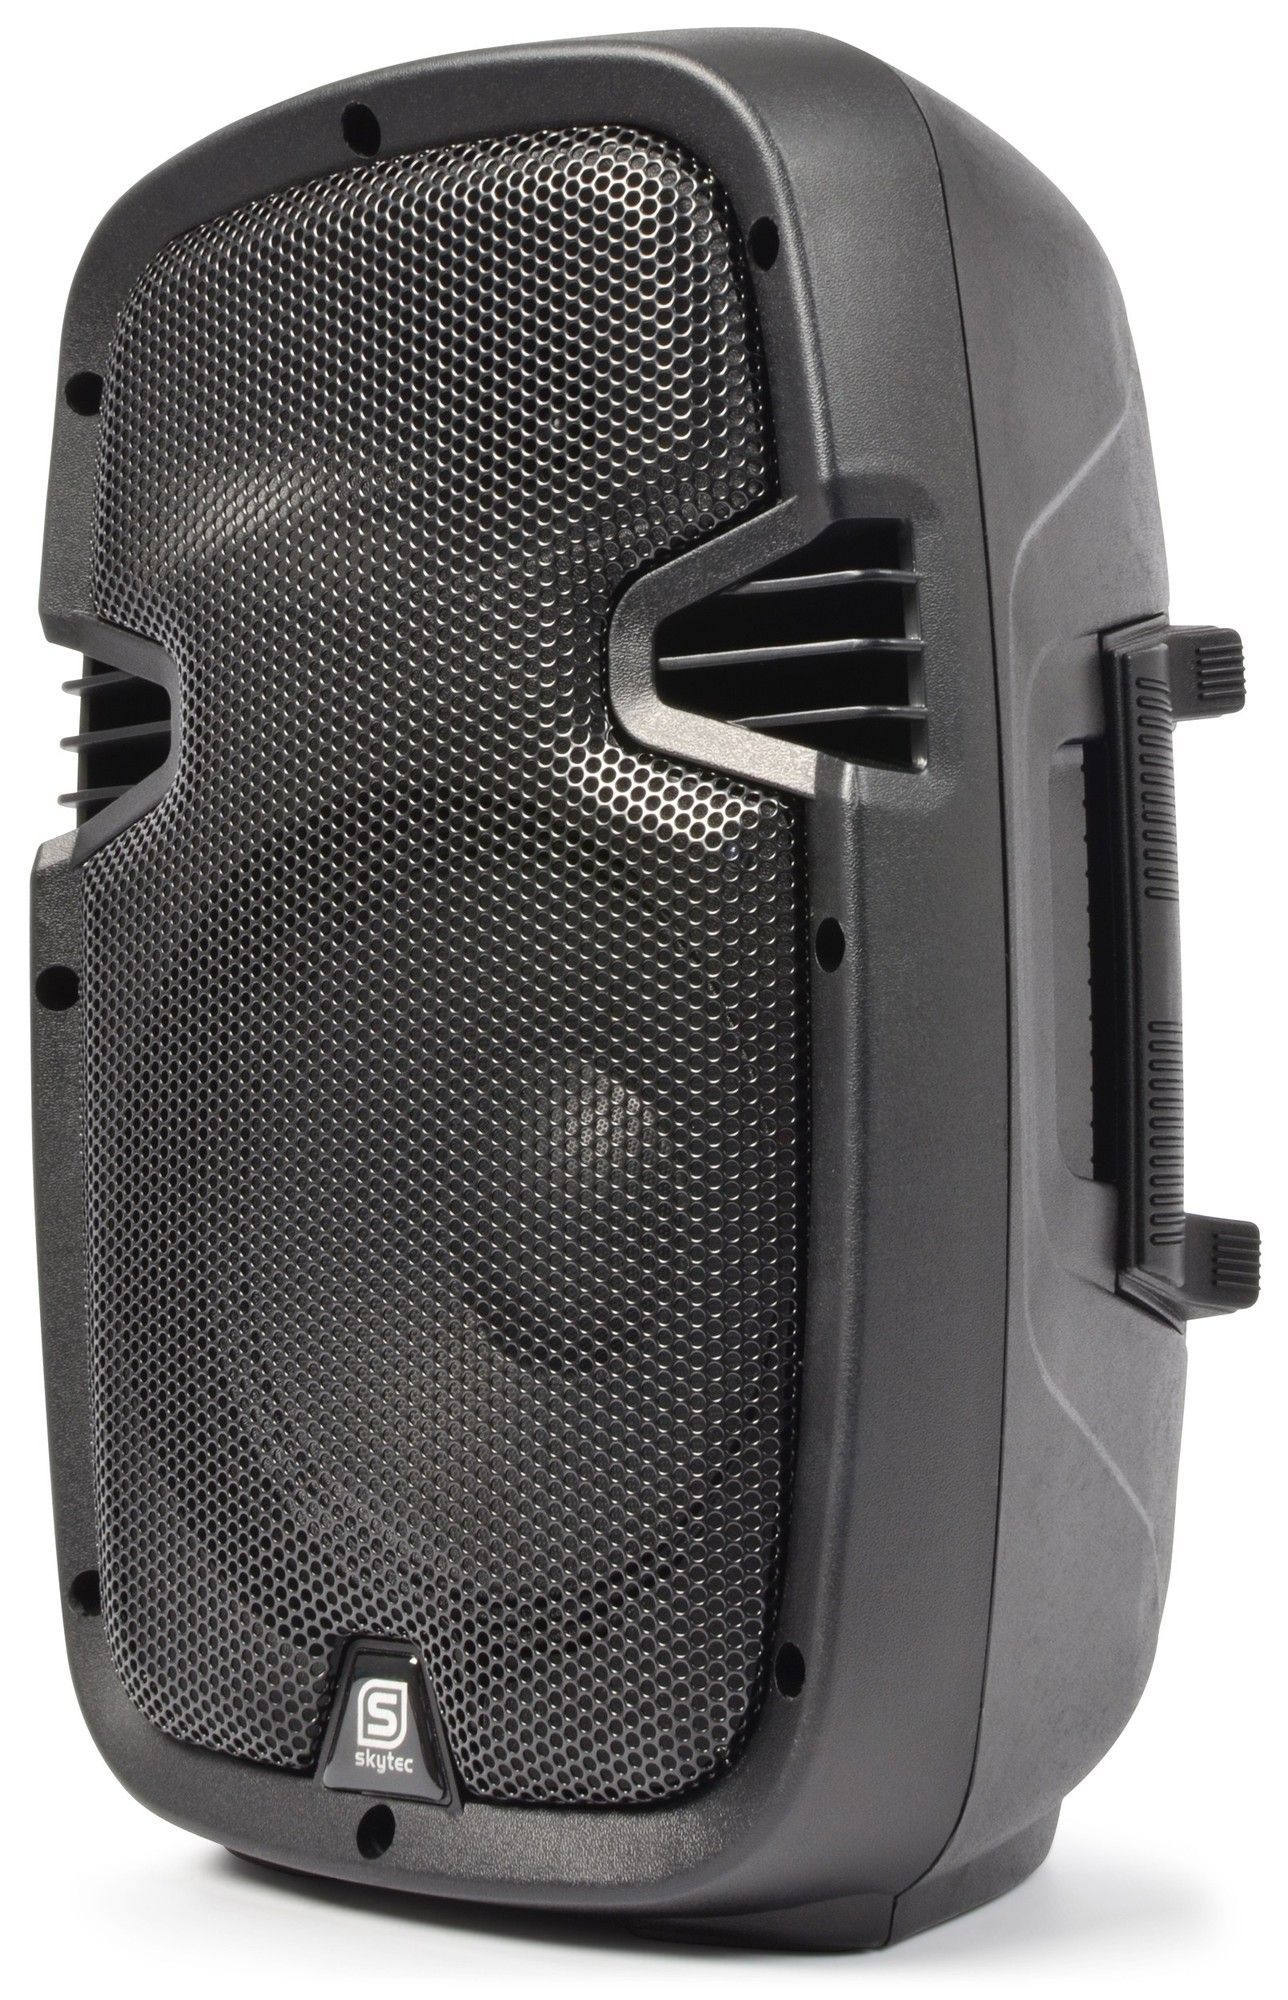 SkyTec SPJ-800ABT actieve speaker 200W met Bluetooth thumbnail